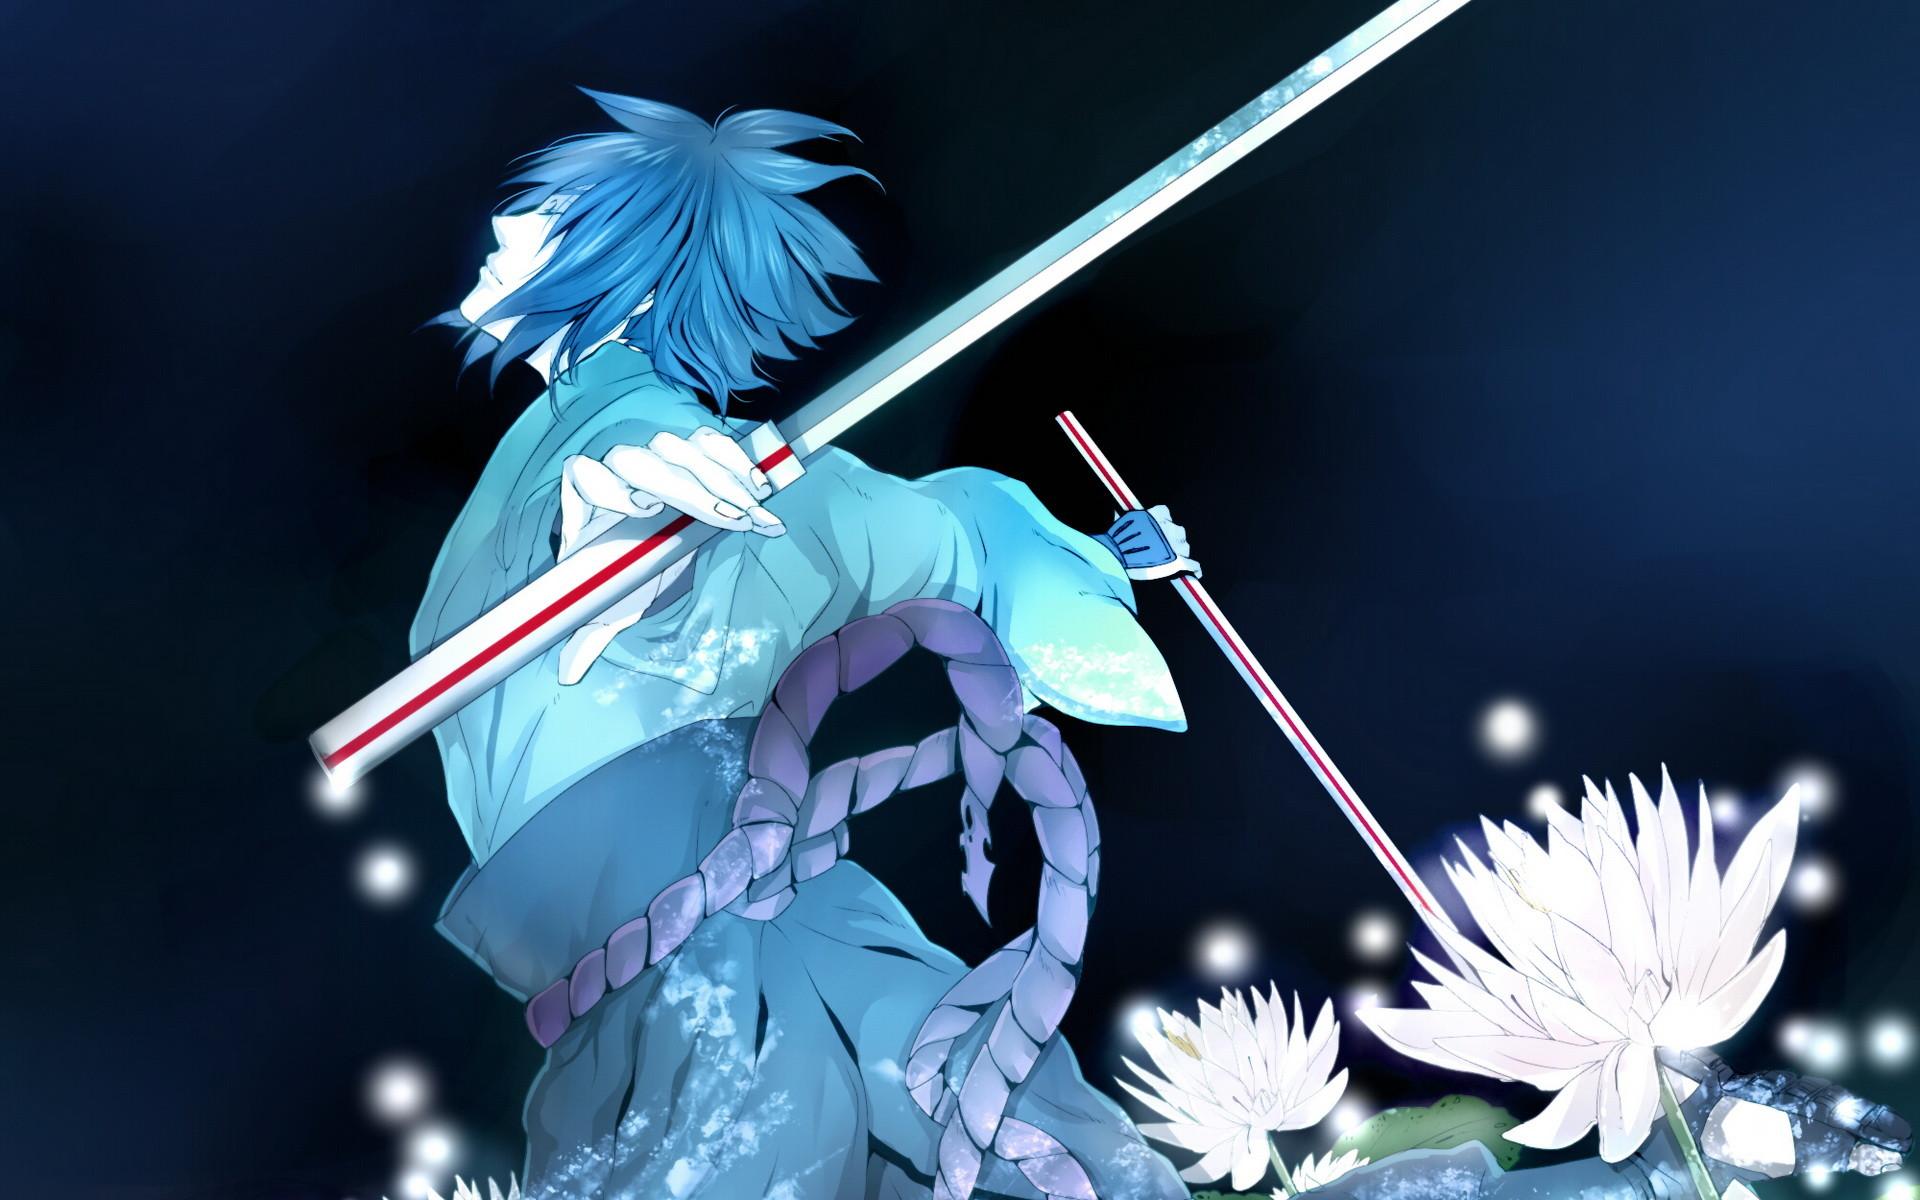 Naruto Uchiha sasuke Windows 8.1 Theme | All for Windows 10 Free